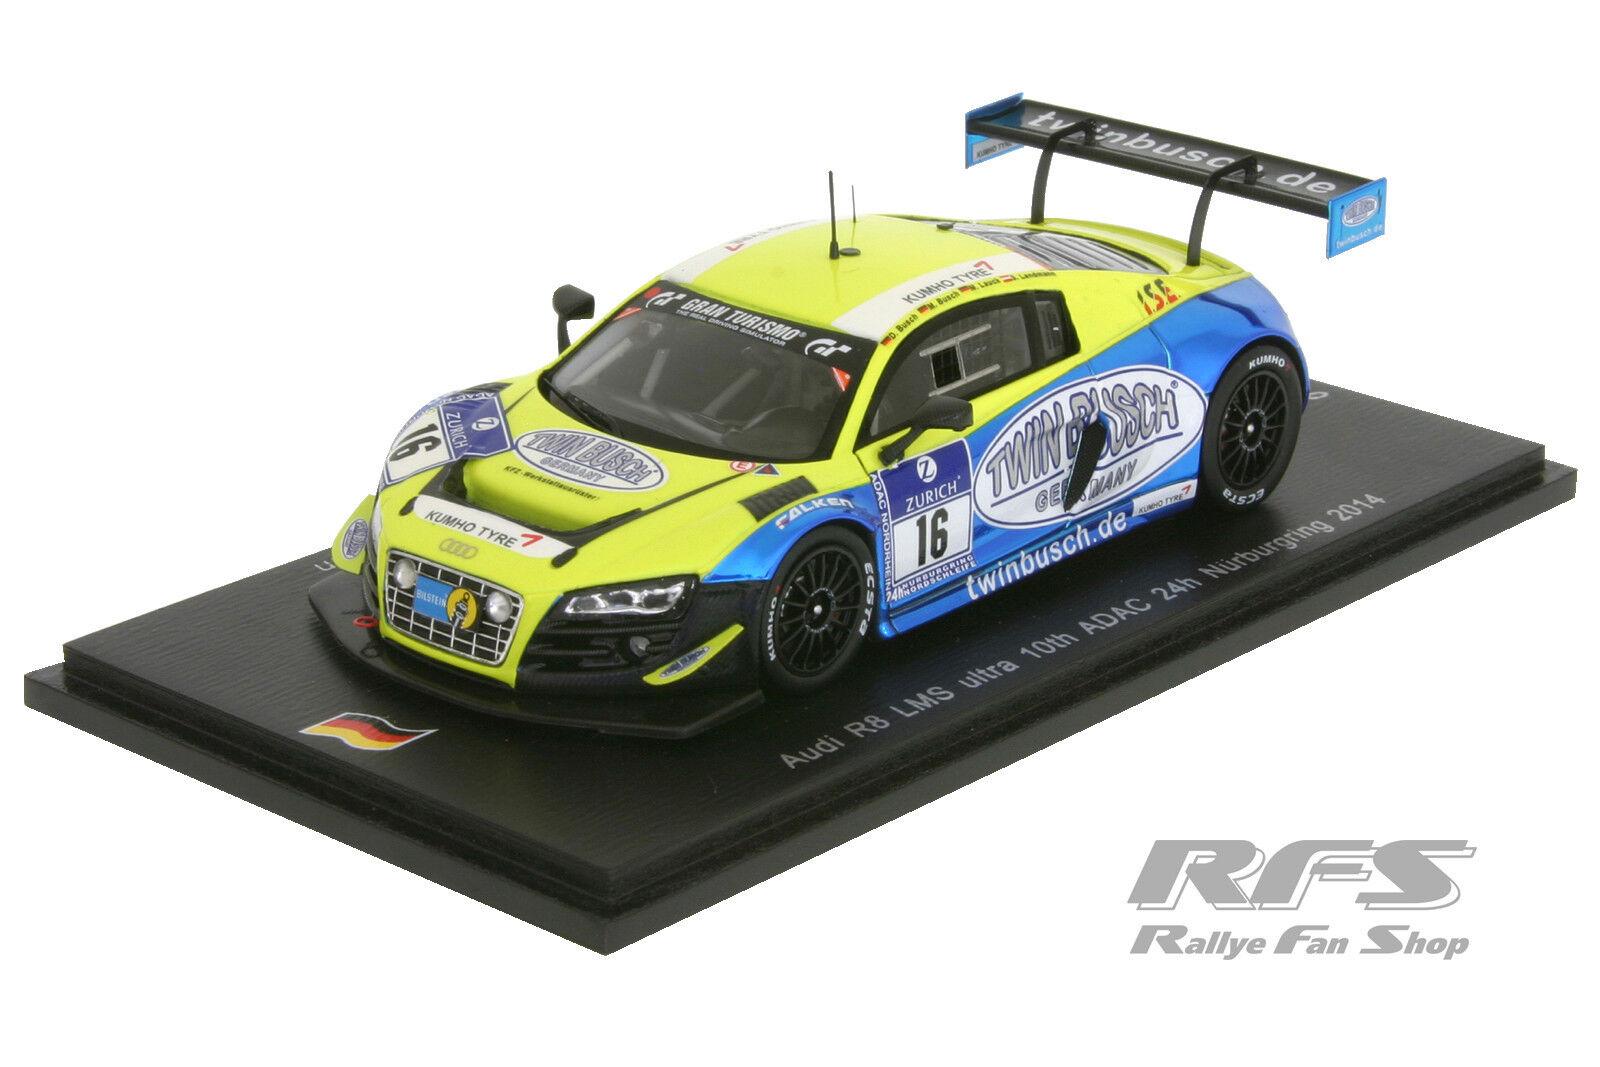 Audi R8 LMS ultra - Team Twin Busch - 24h Nürburgring 2014 - 1 43 Spark SG137